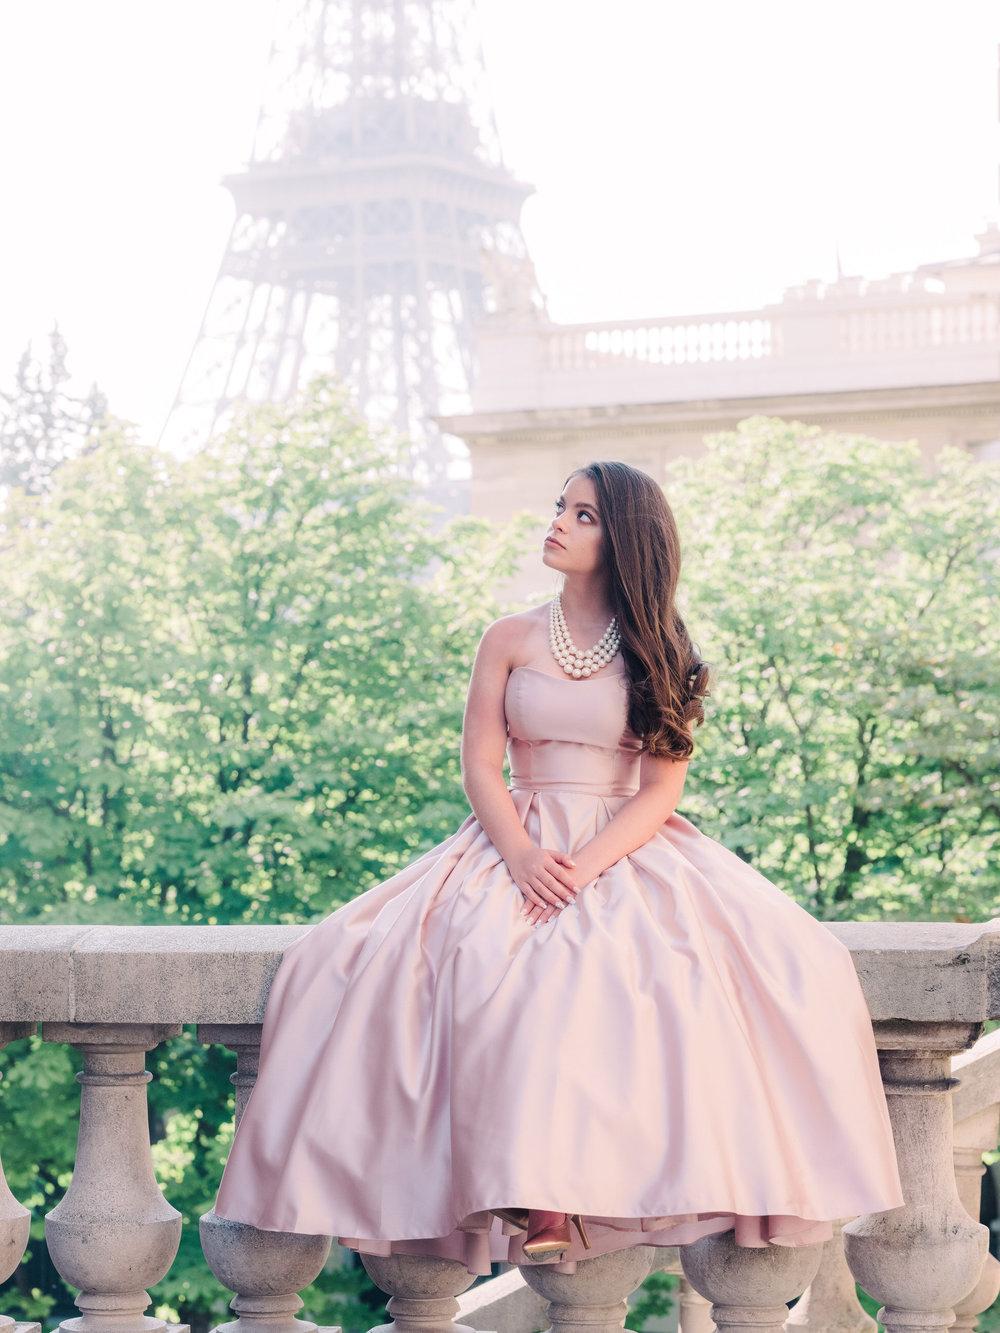 {Amanda's Quinceãnera} - a beautiful day in Paris